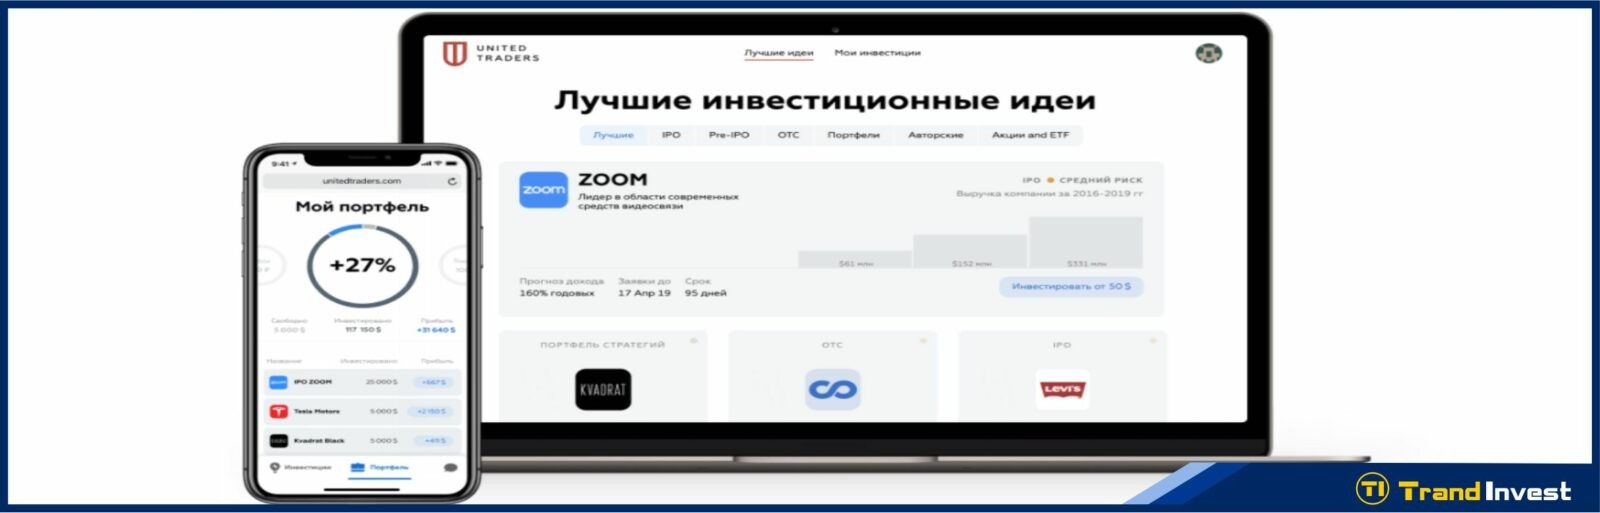 United Traders платформа